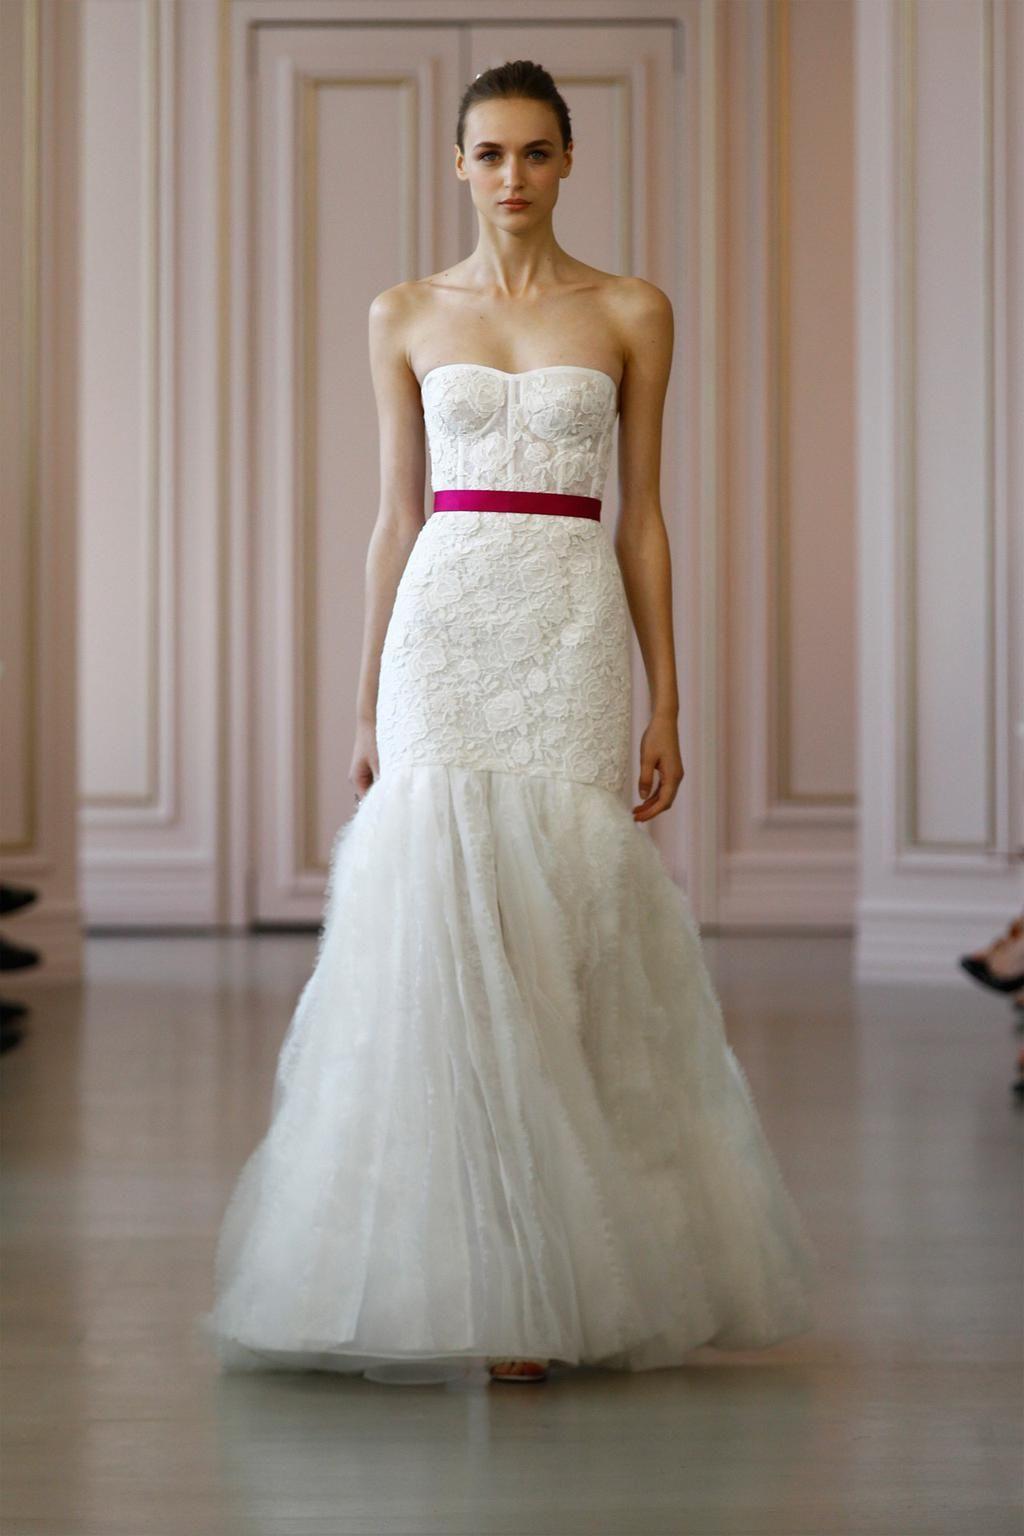 White puffy wedding dresses  British Vogue on  Weddings